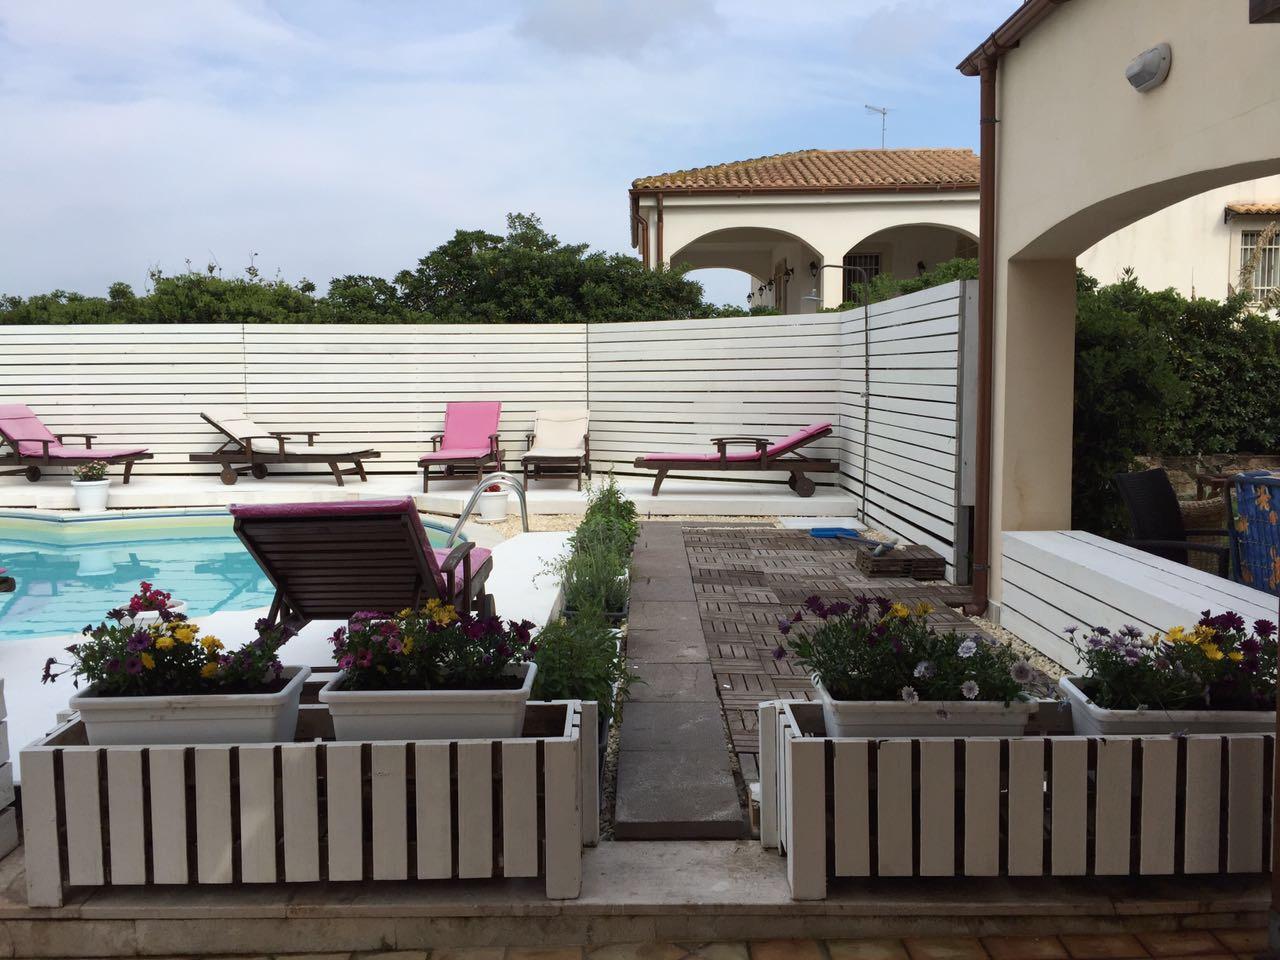 Maison de vacances Salvo's Villa Sonne und Strand auf Sizilien (802573), Siracusa, Siracusa, Sicile, Italie, image 19